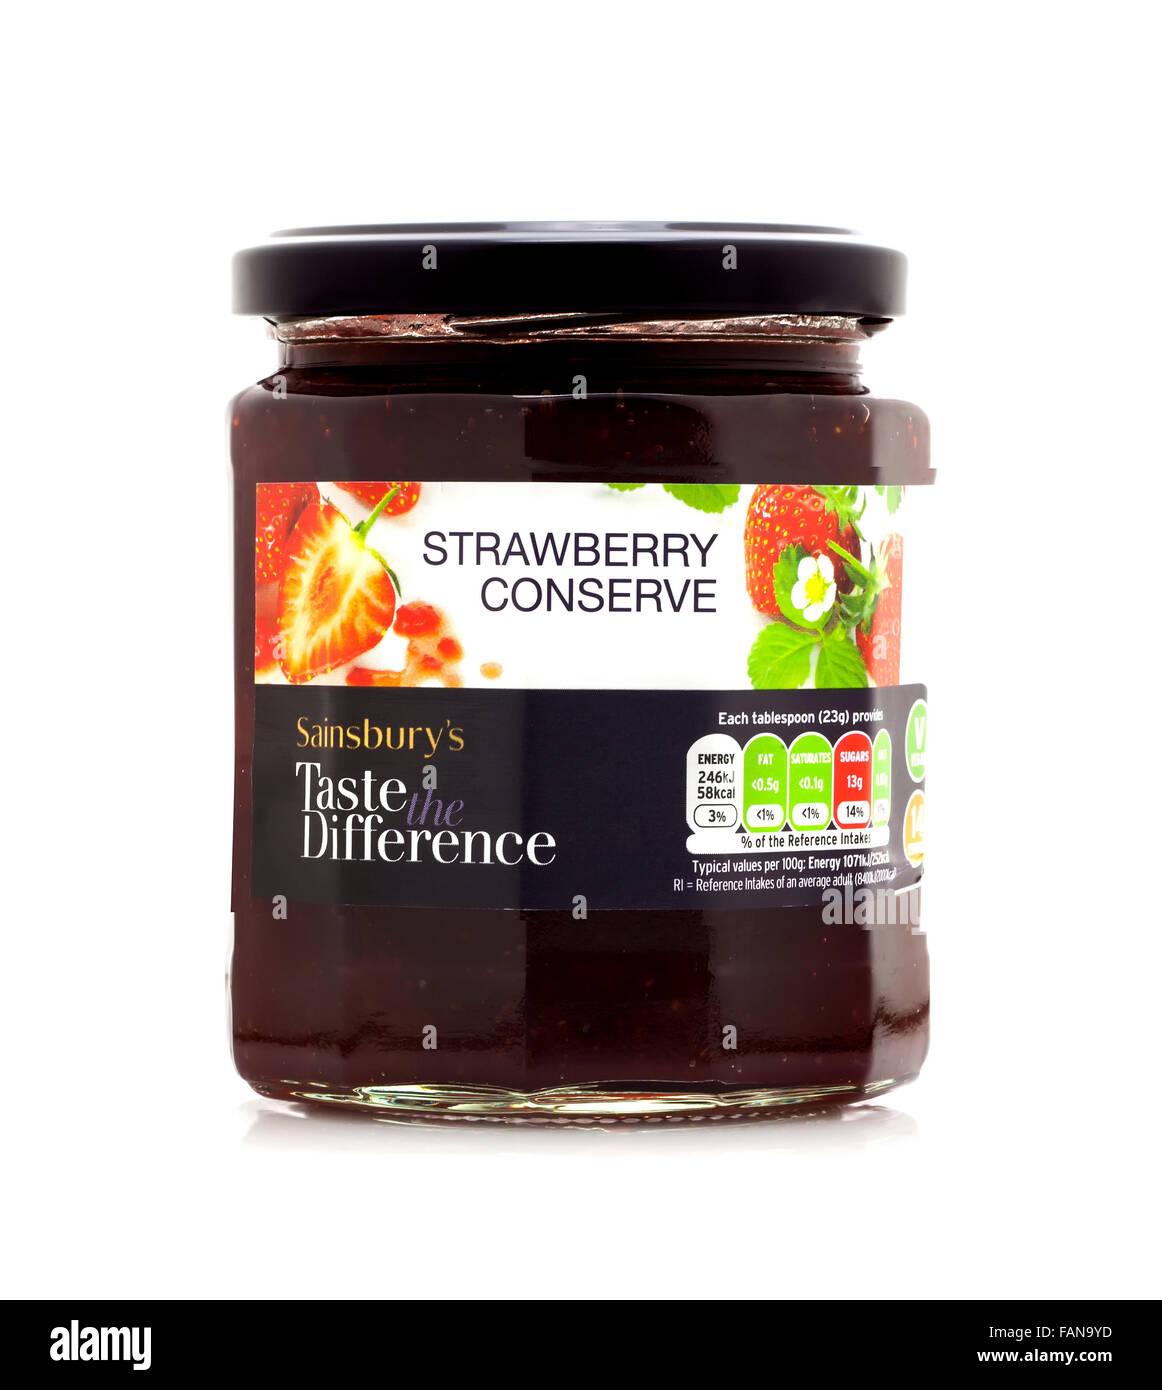 Jar of Sainsburys Strawberry Conserve on a white background - Stock Image